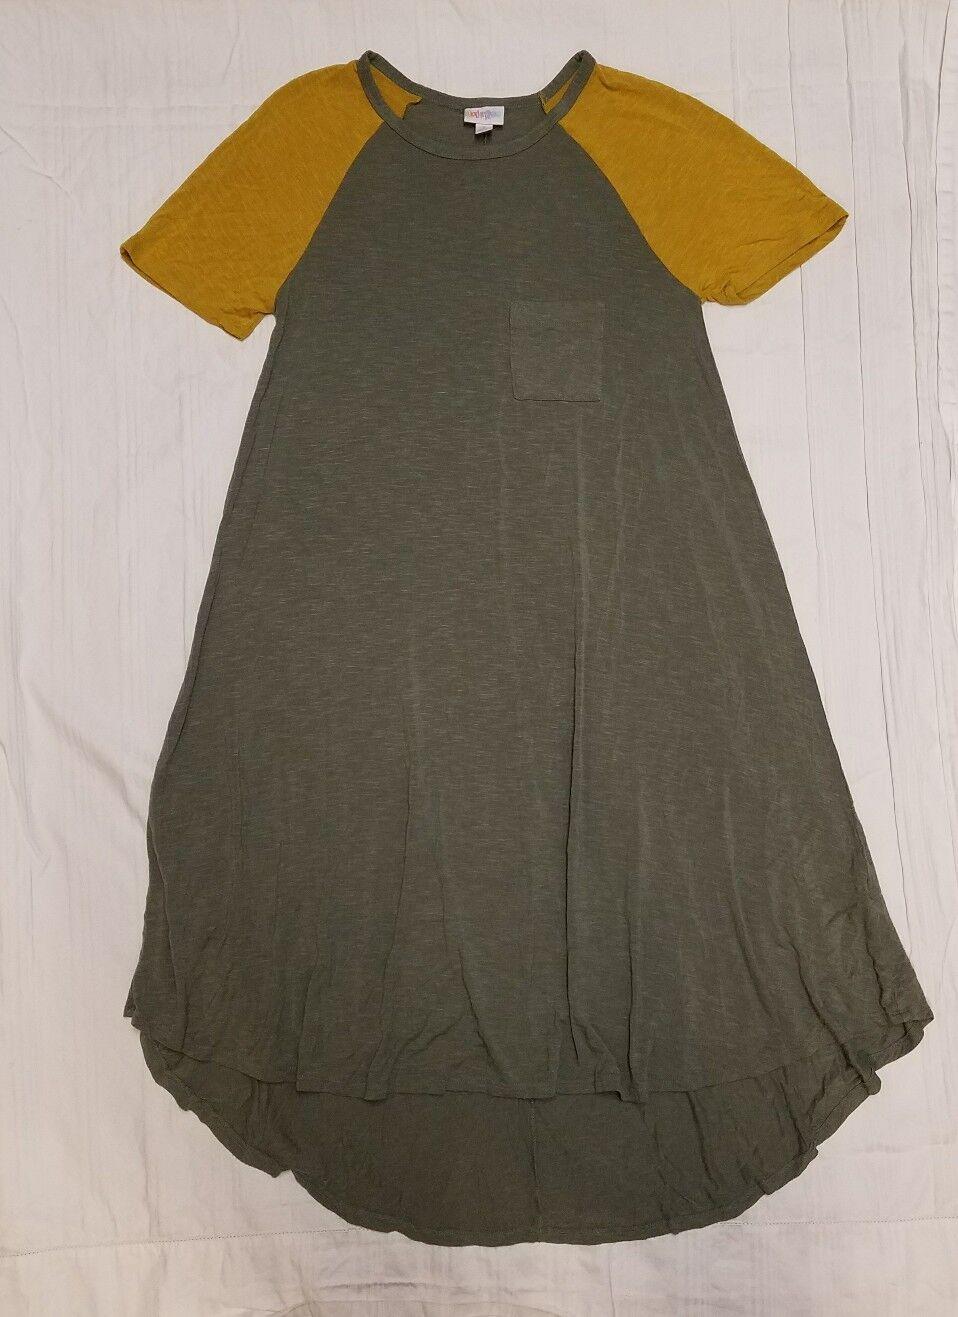 LULAROE Carly Raglan Pocket Dress Mustard Gelb Sage Grün damen SZ S